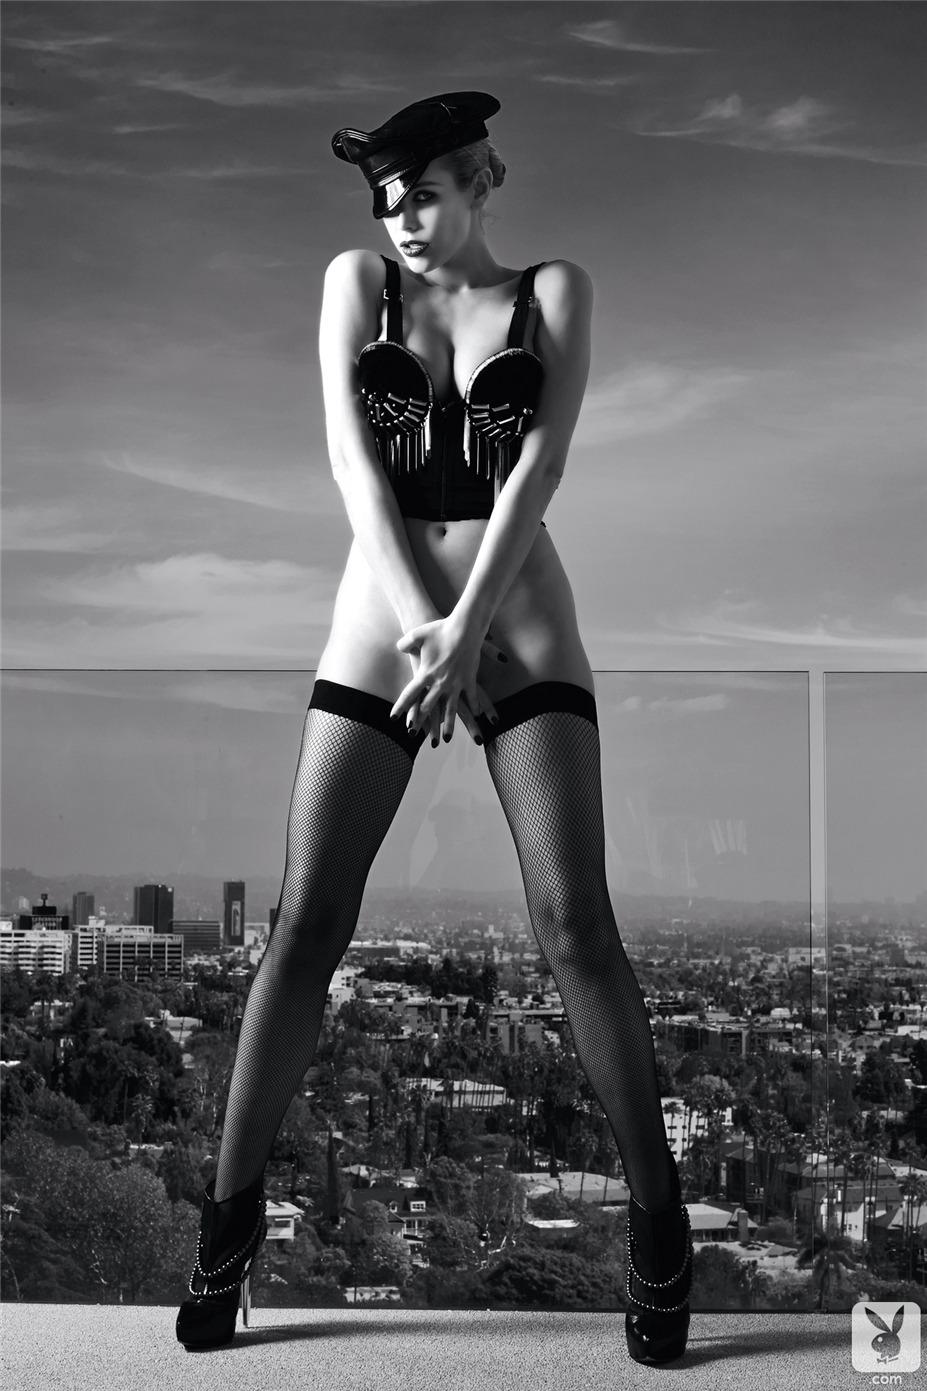 Девушка года Кеннеди Саммерс / Kennedy Summers / Playmate of the year 2014 / Playboy USA June 2014